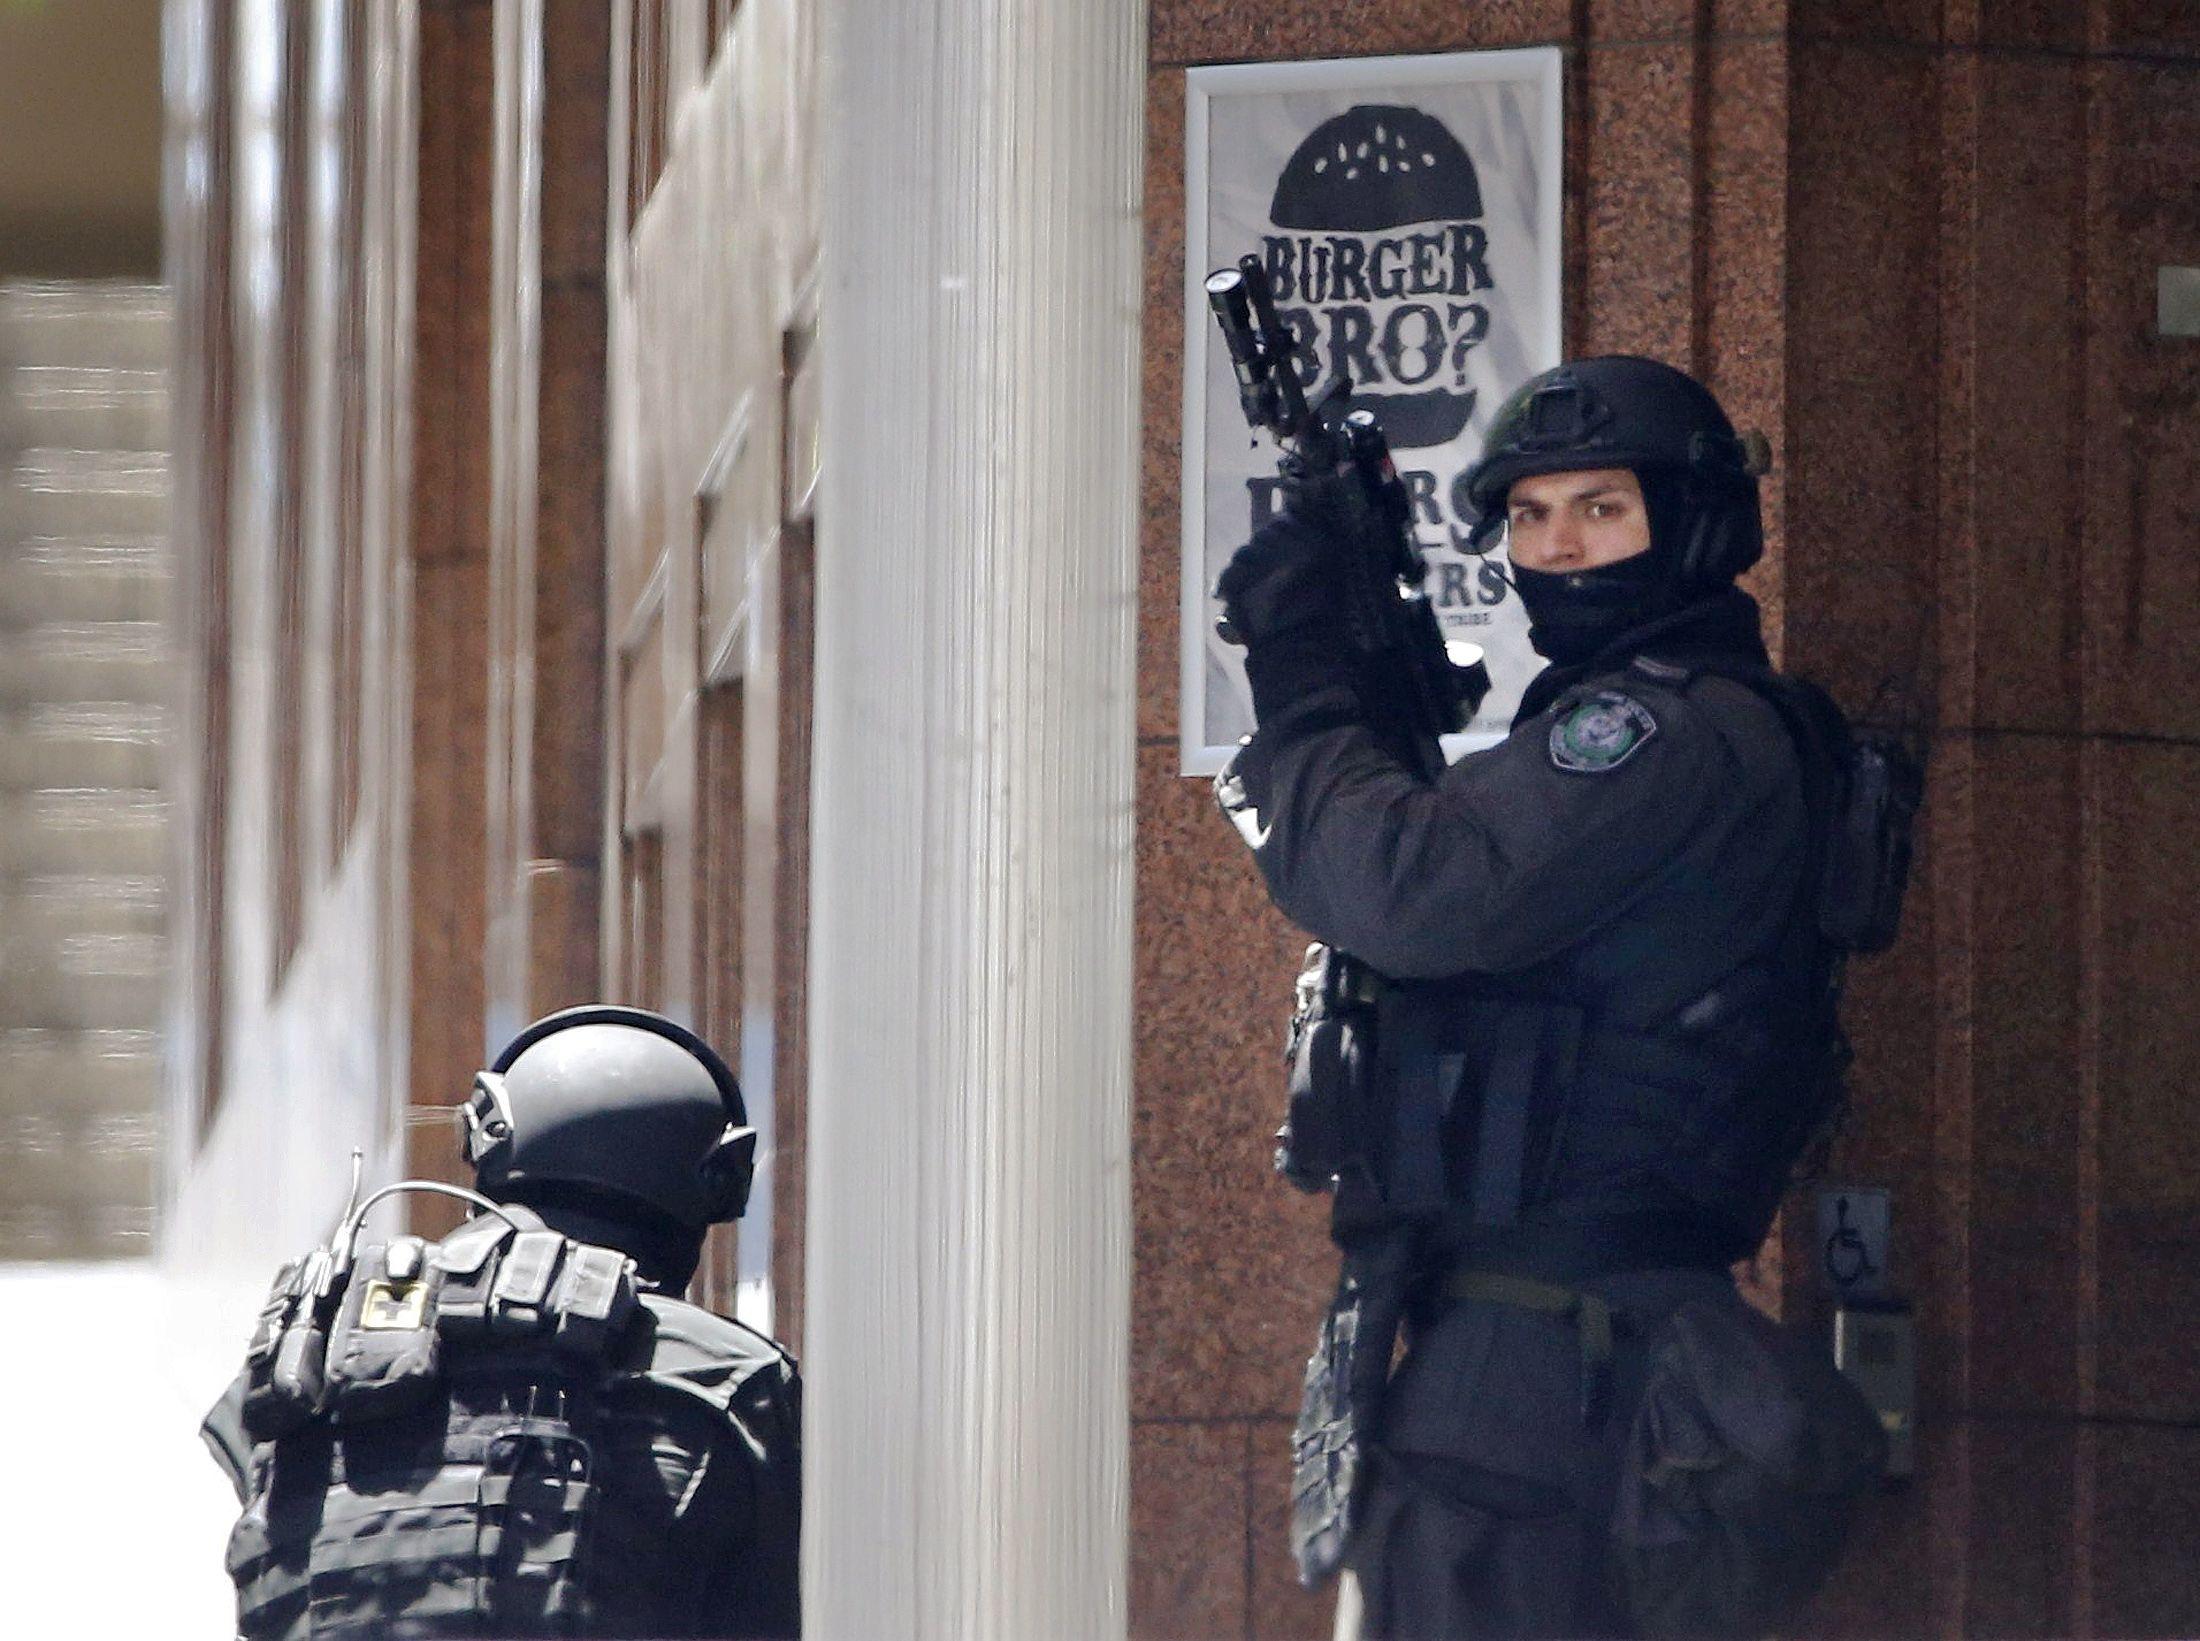 Australian Police at Sydney Siege